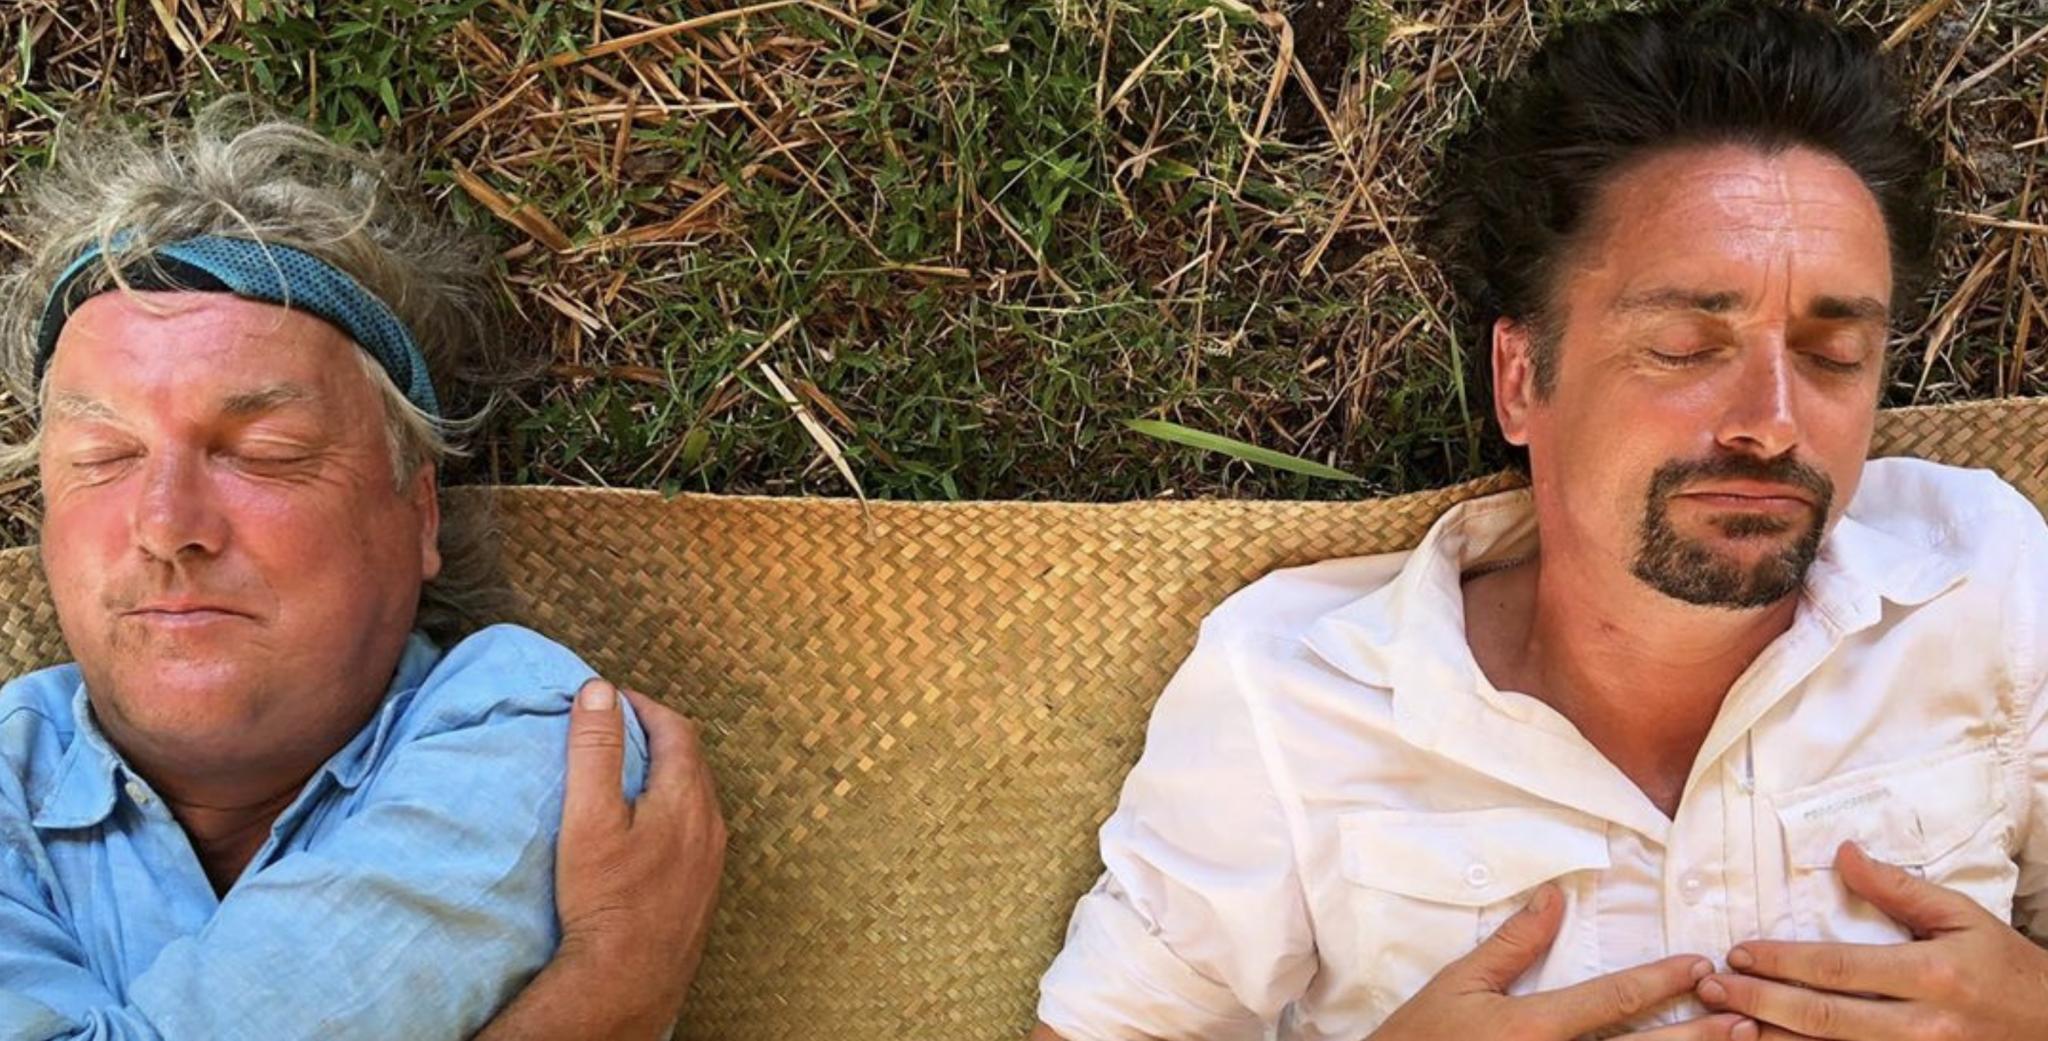 James May, Richard Hammond, The Grand Tour, Amazon-https://www.instagram.com/p/B47LEa1AGrK/